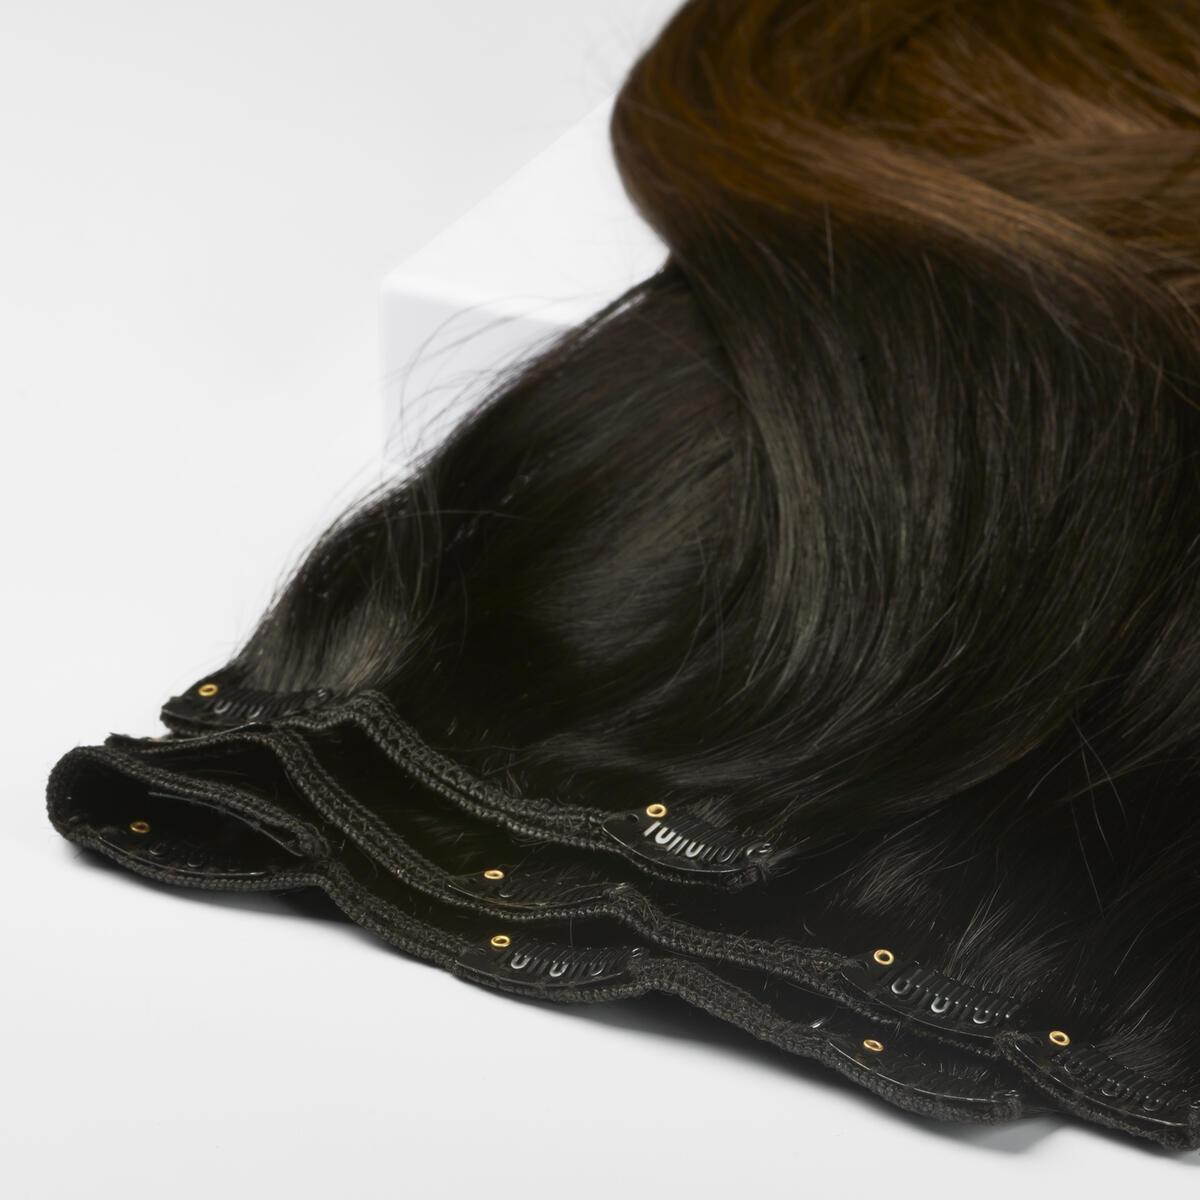 Clip-on set O1.2/2.0 Black Brown Ombre 50 cm